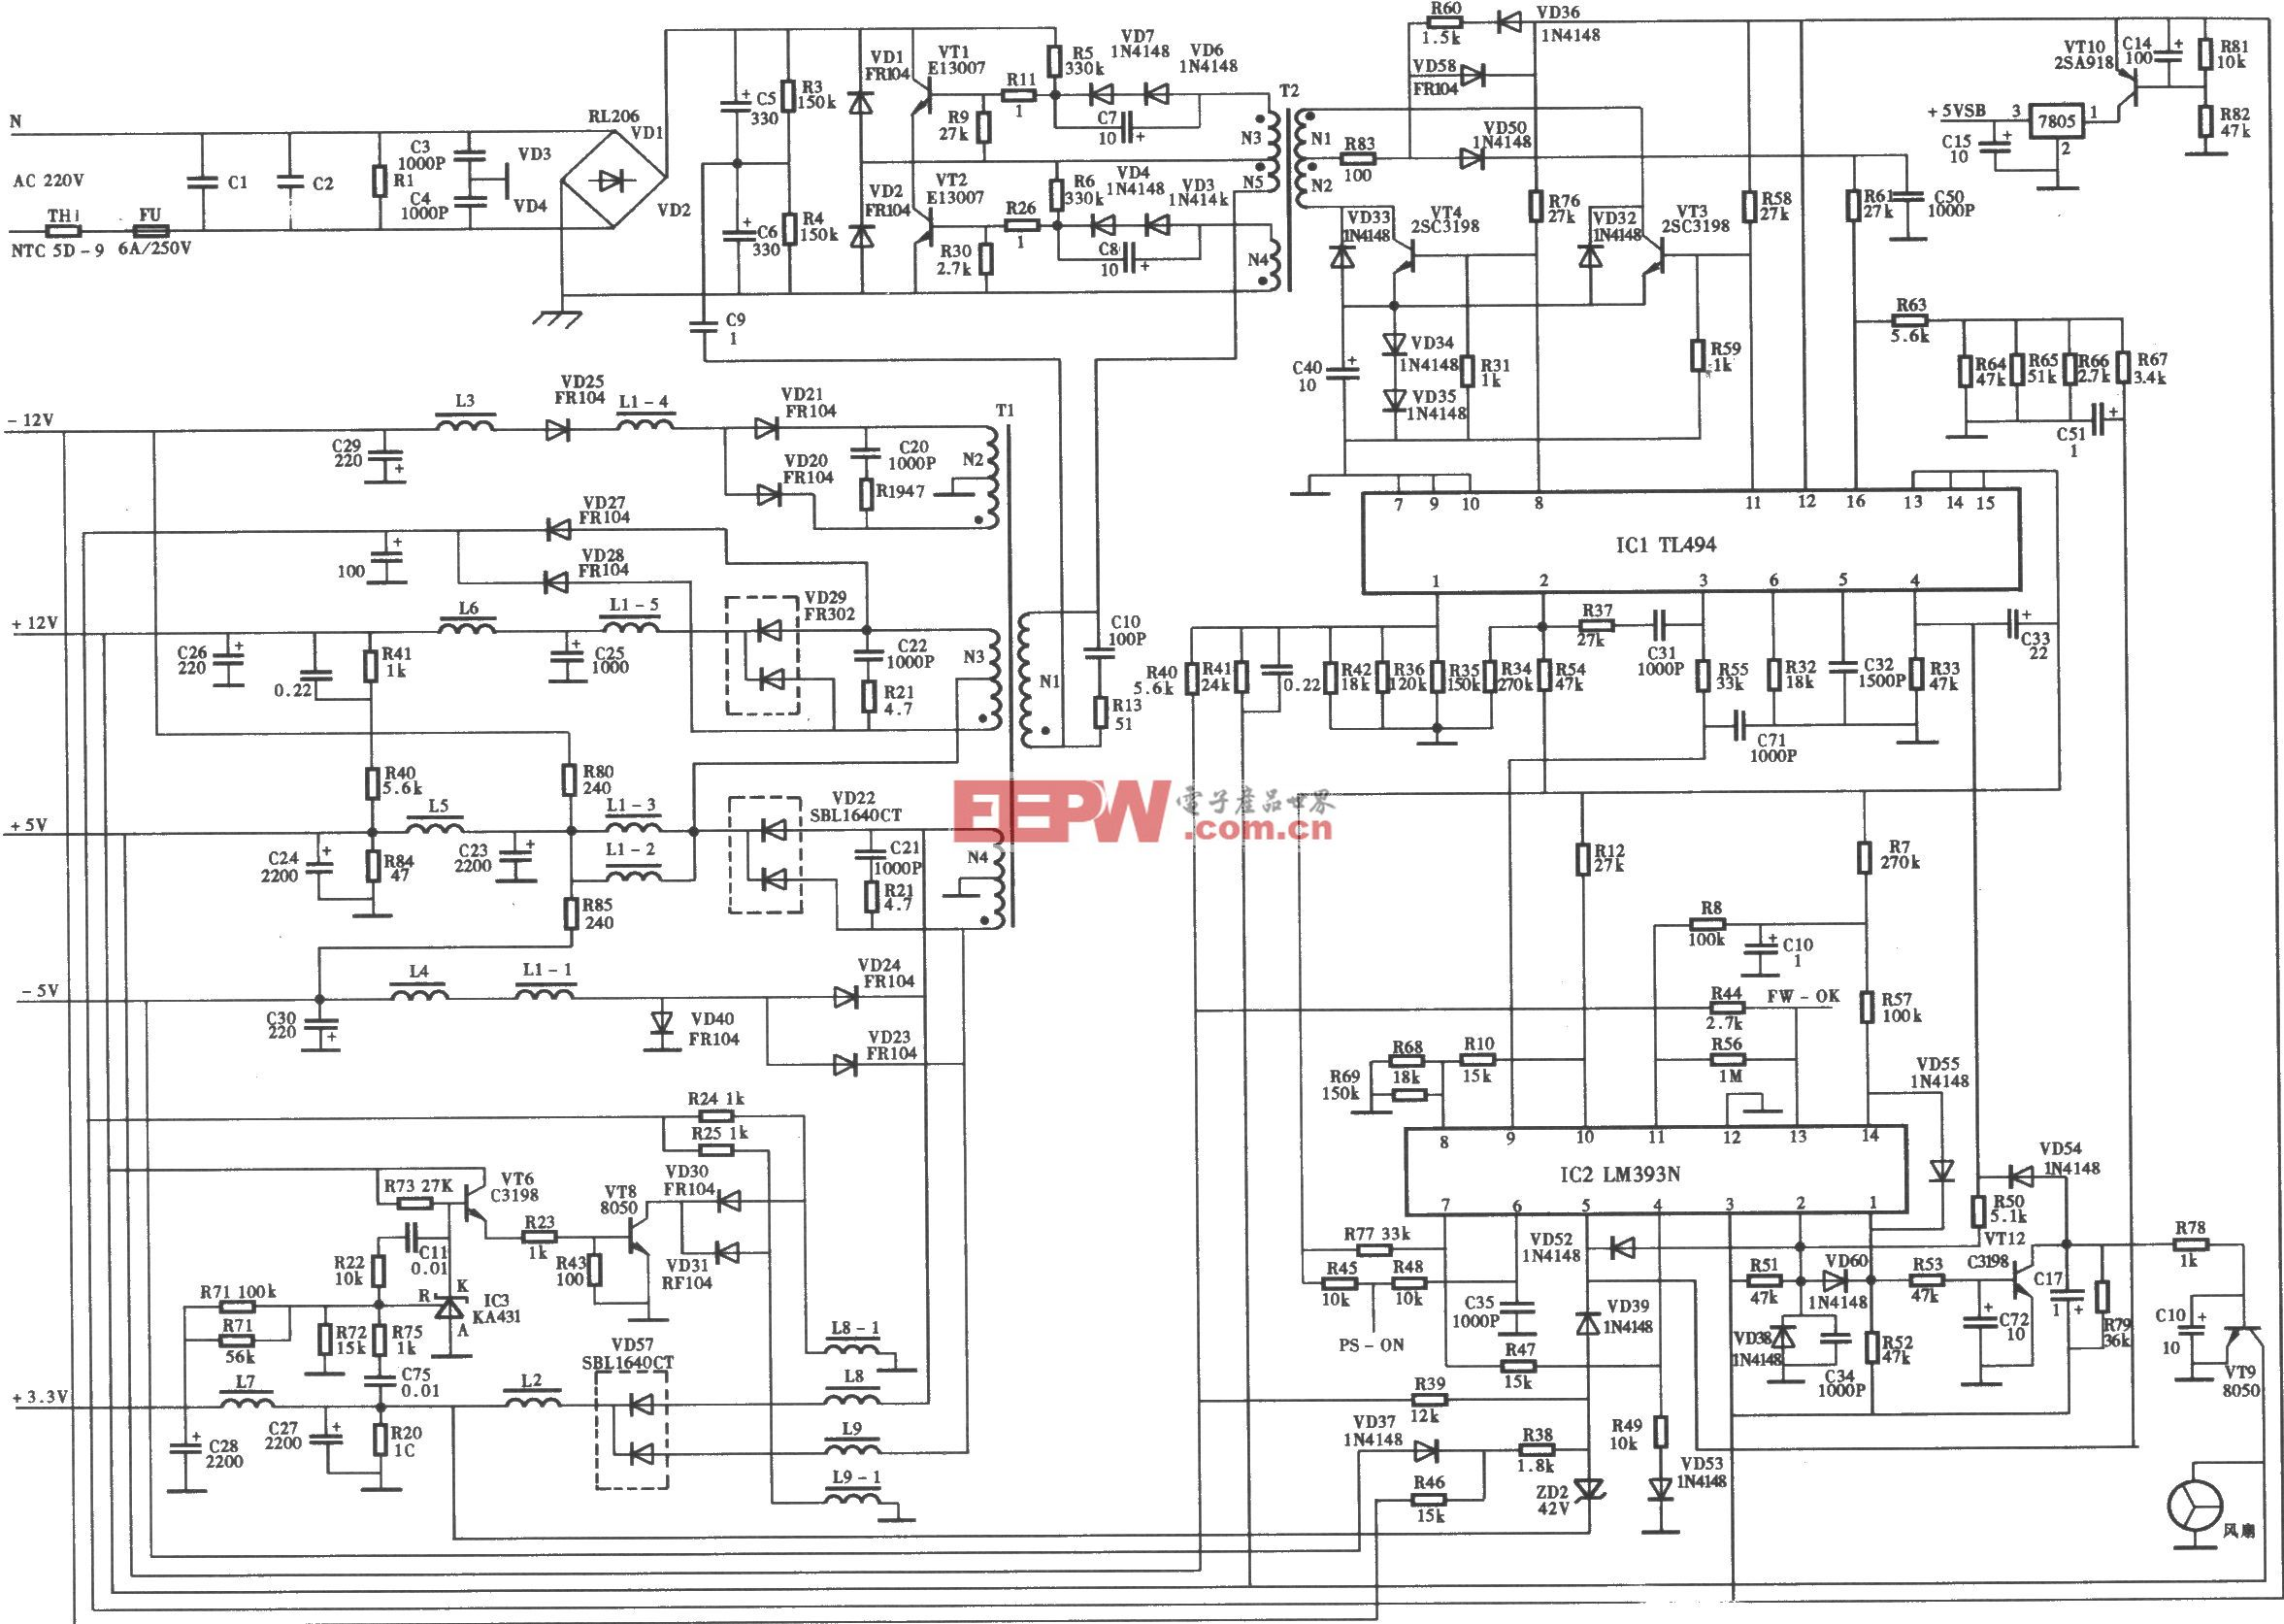 百盛BS-2506-1型ATX开关电源(TL494) 电路